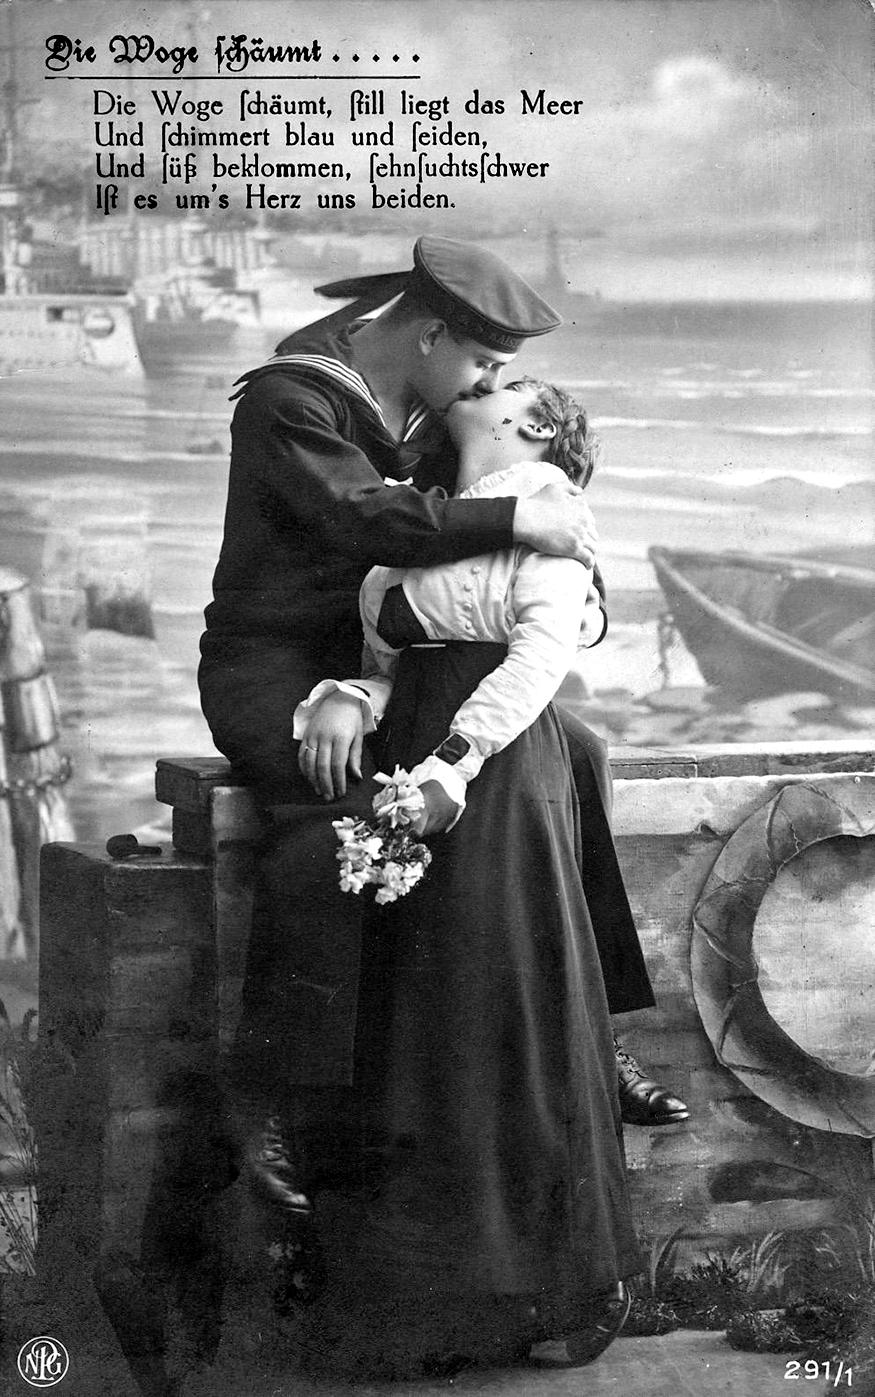 Jedna od mnogih razglednica ljubavne tematike koje je austrougarski mornar na bojnom brodu S.M.S. Arpad, Stefan Cvitak,  od 1914. do 1918. slao iz Pule u Zagreb svojoj ljubljenoj Slavici Kodrin